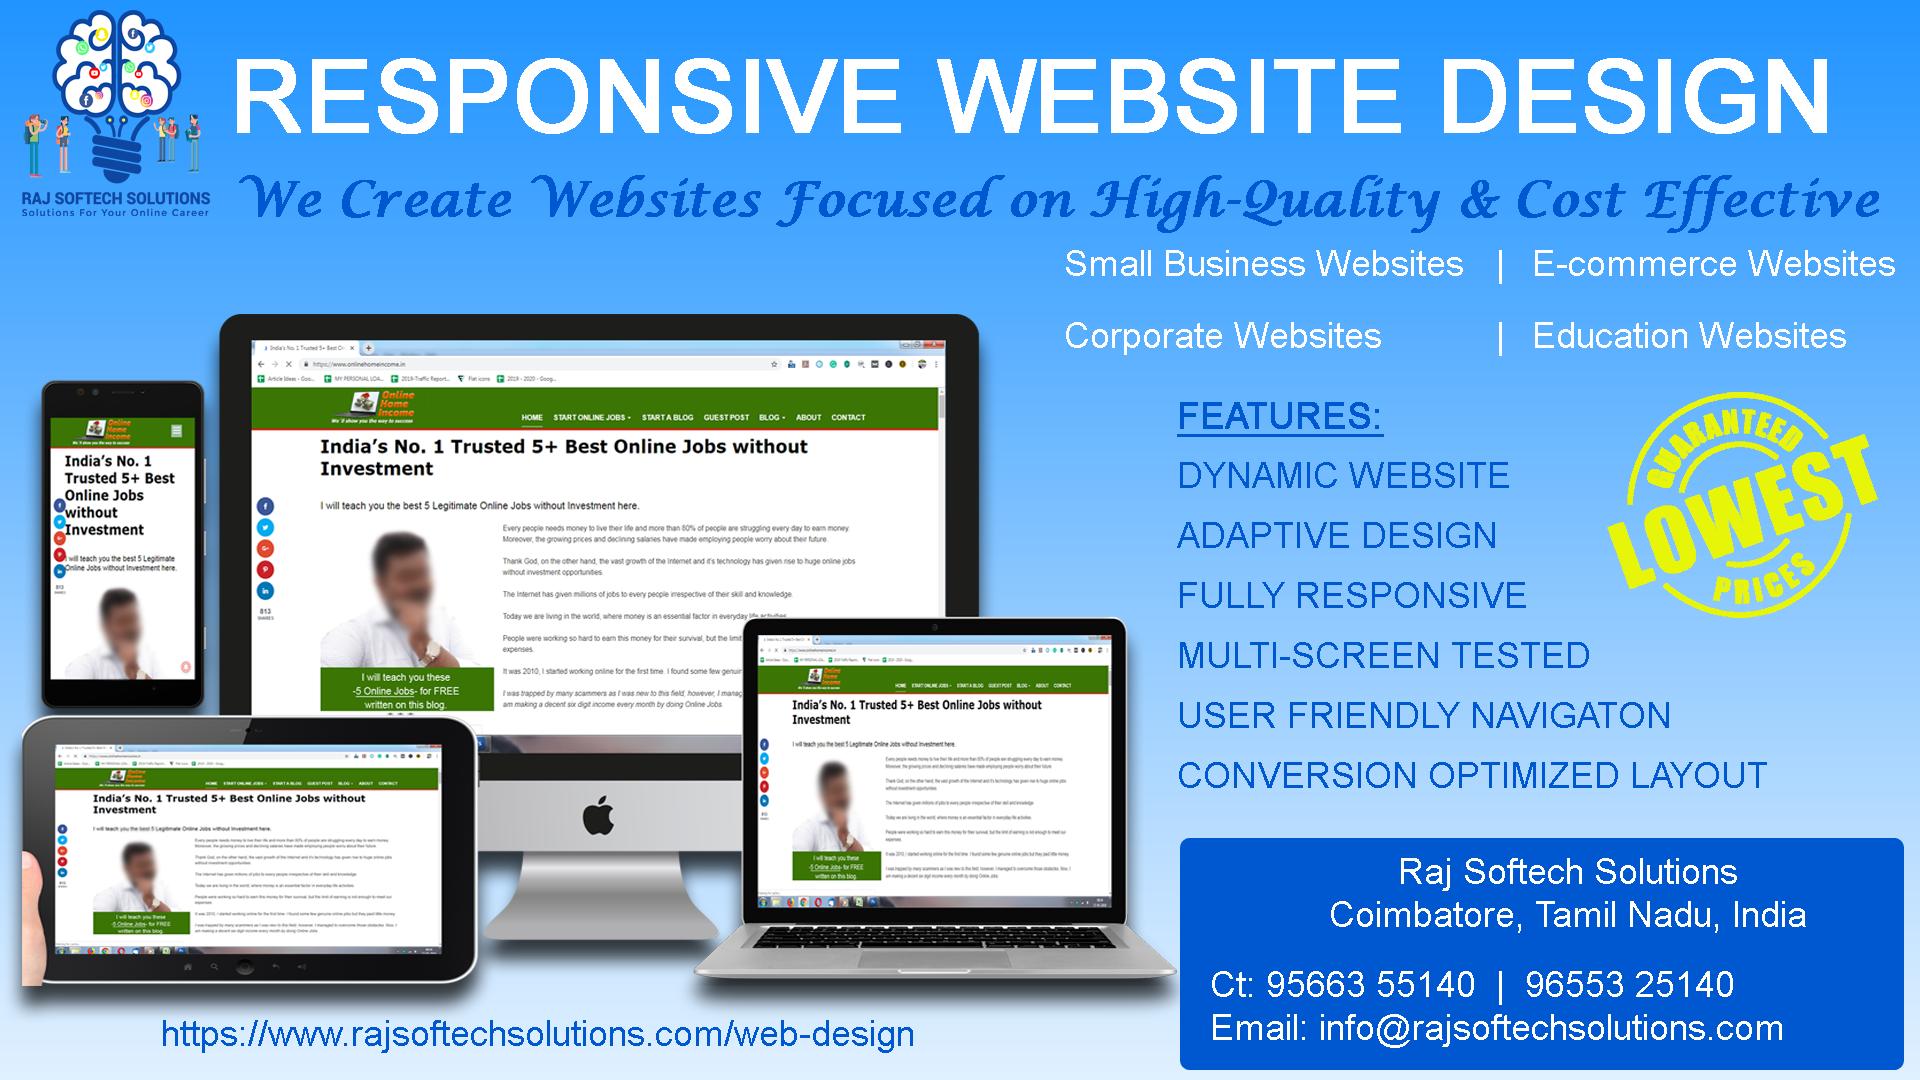 Responsive Website Design Web Design Responsive Website Design Web Design Company